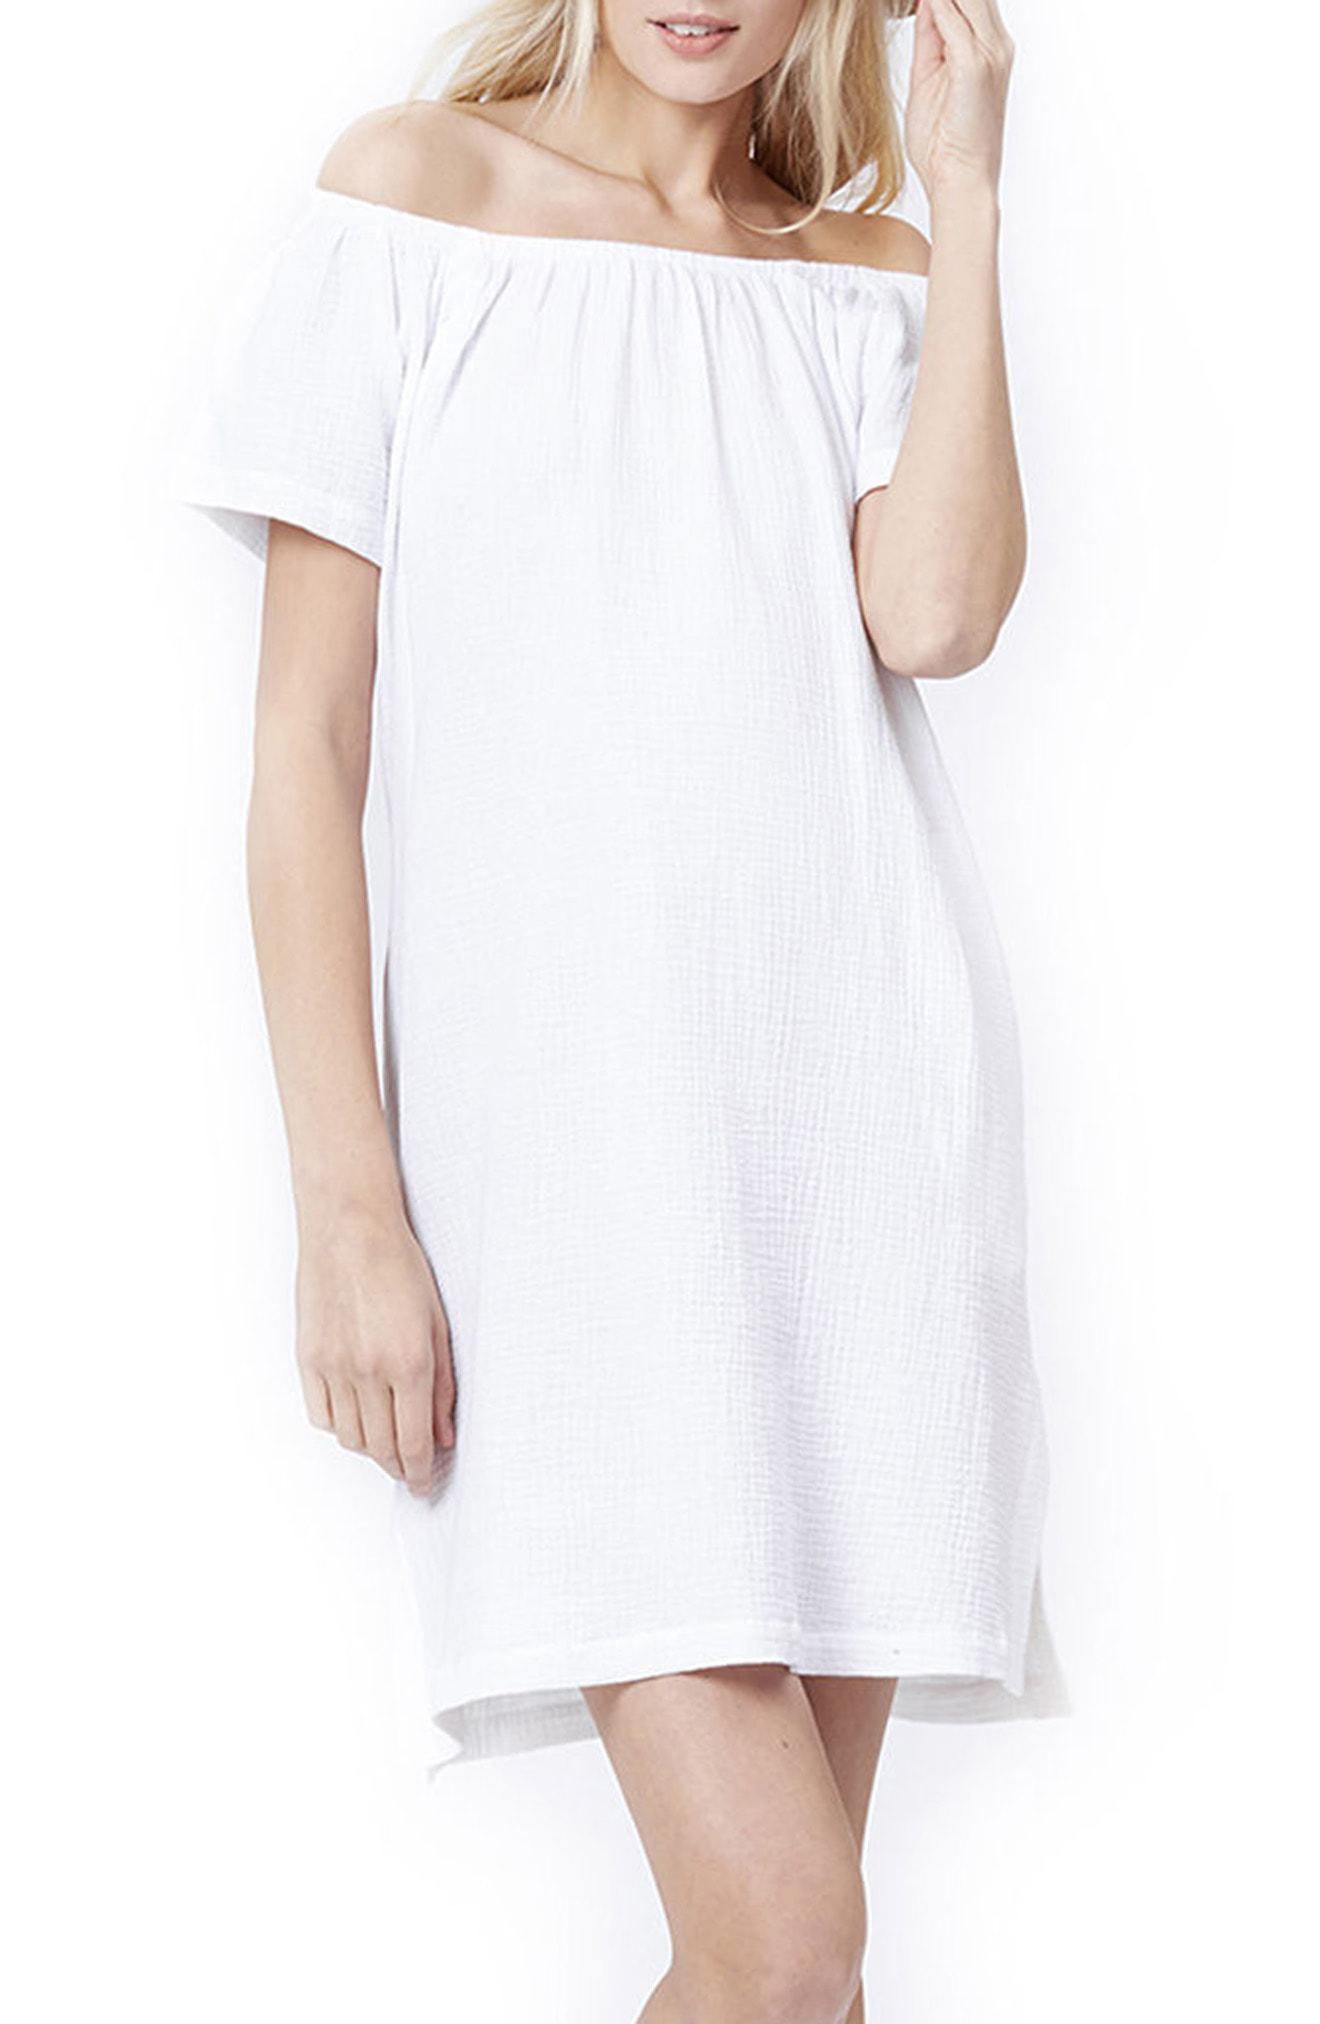 6642ce3378 Lyst - Loyal Hana Arie Off The Shoulder Maternity nursing Dress in White